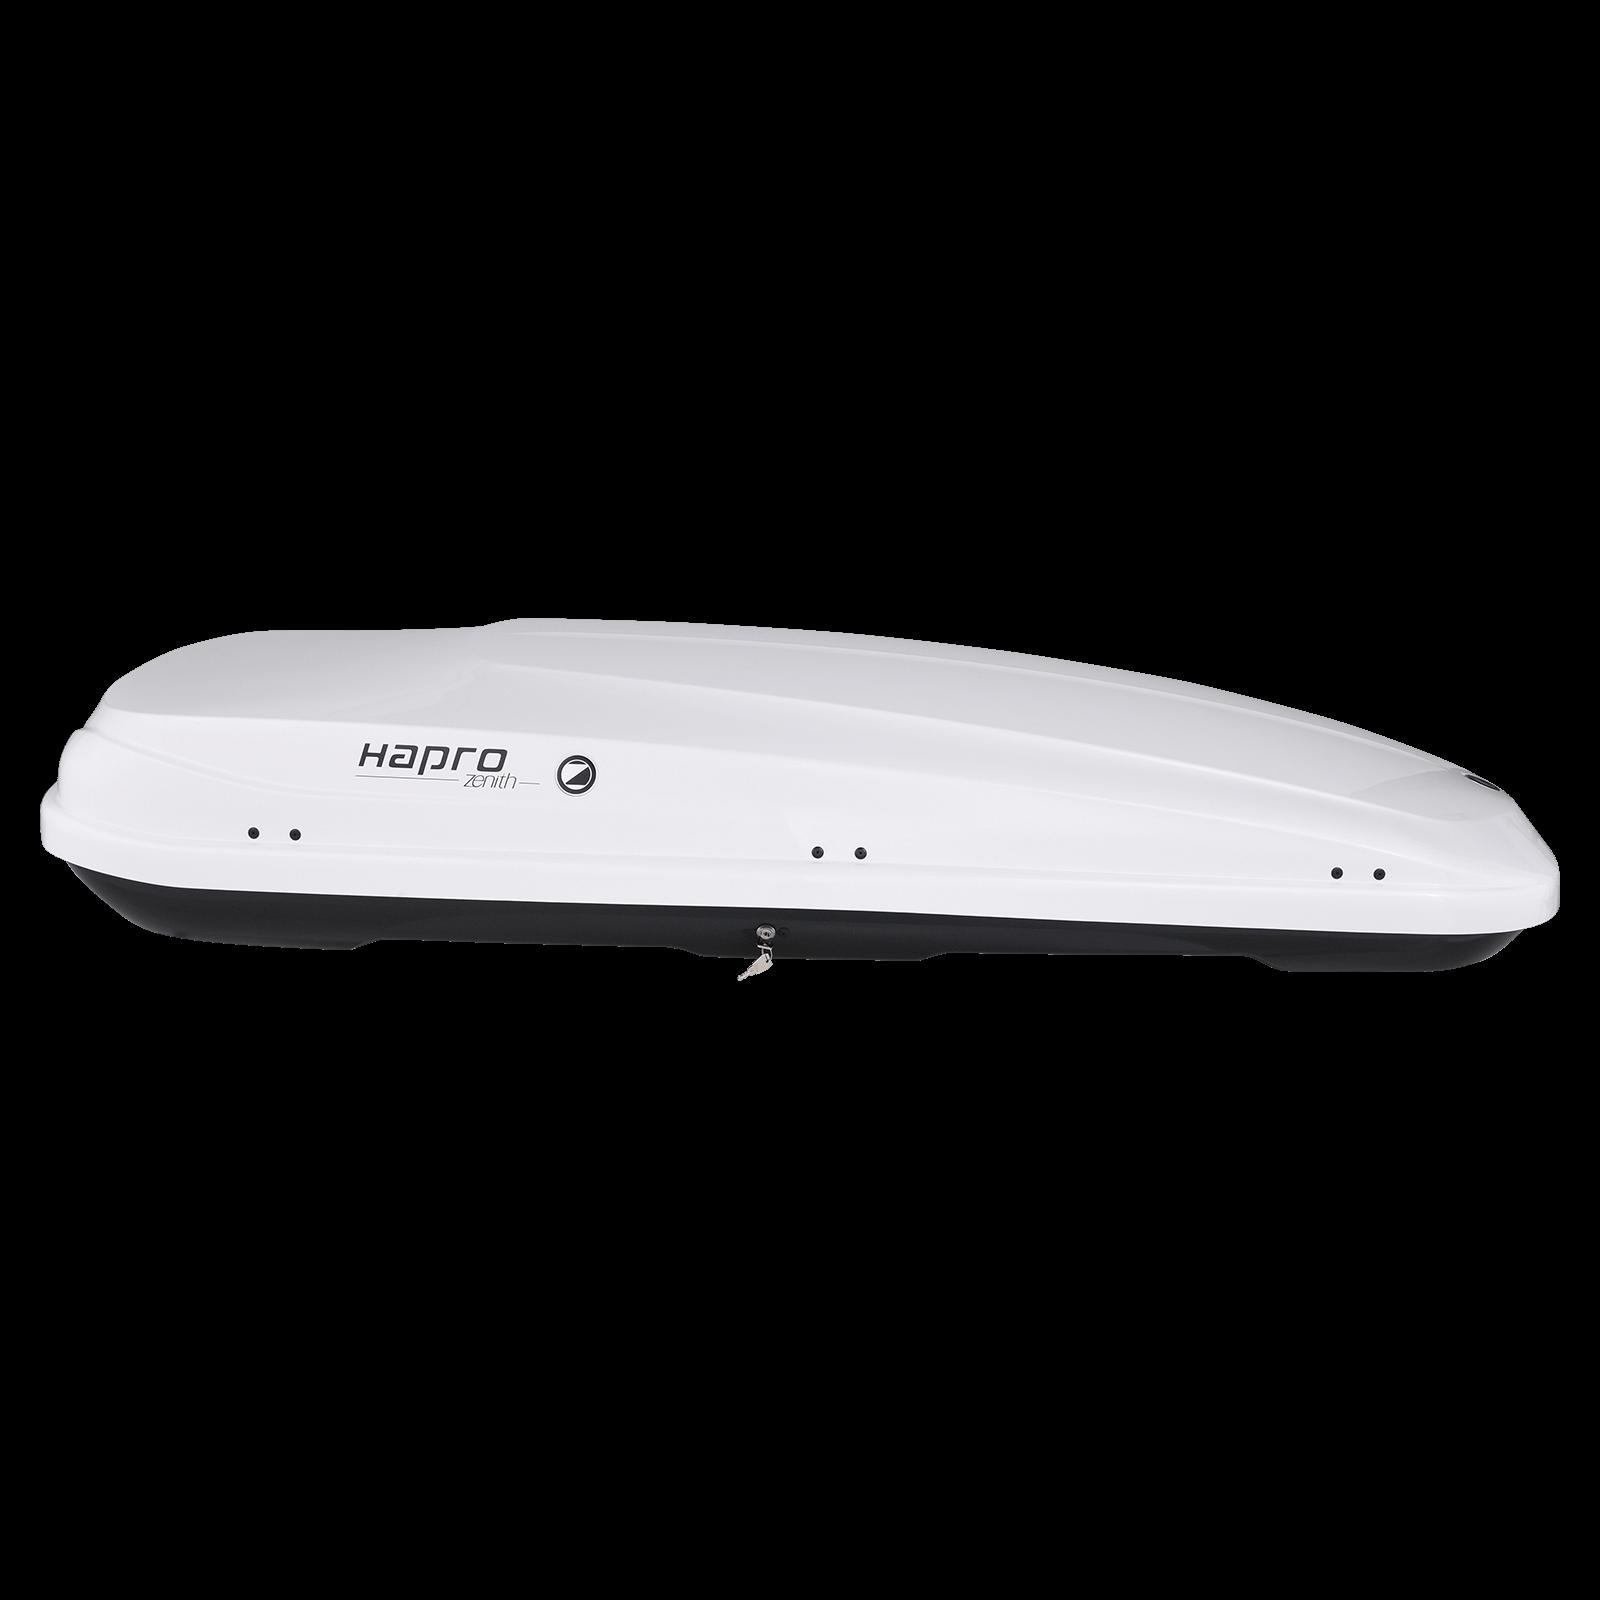 Dachbox Hapro Zenith 8.6 PureWhite - Bild 4